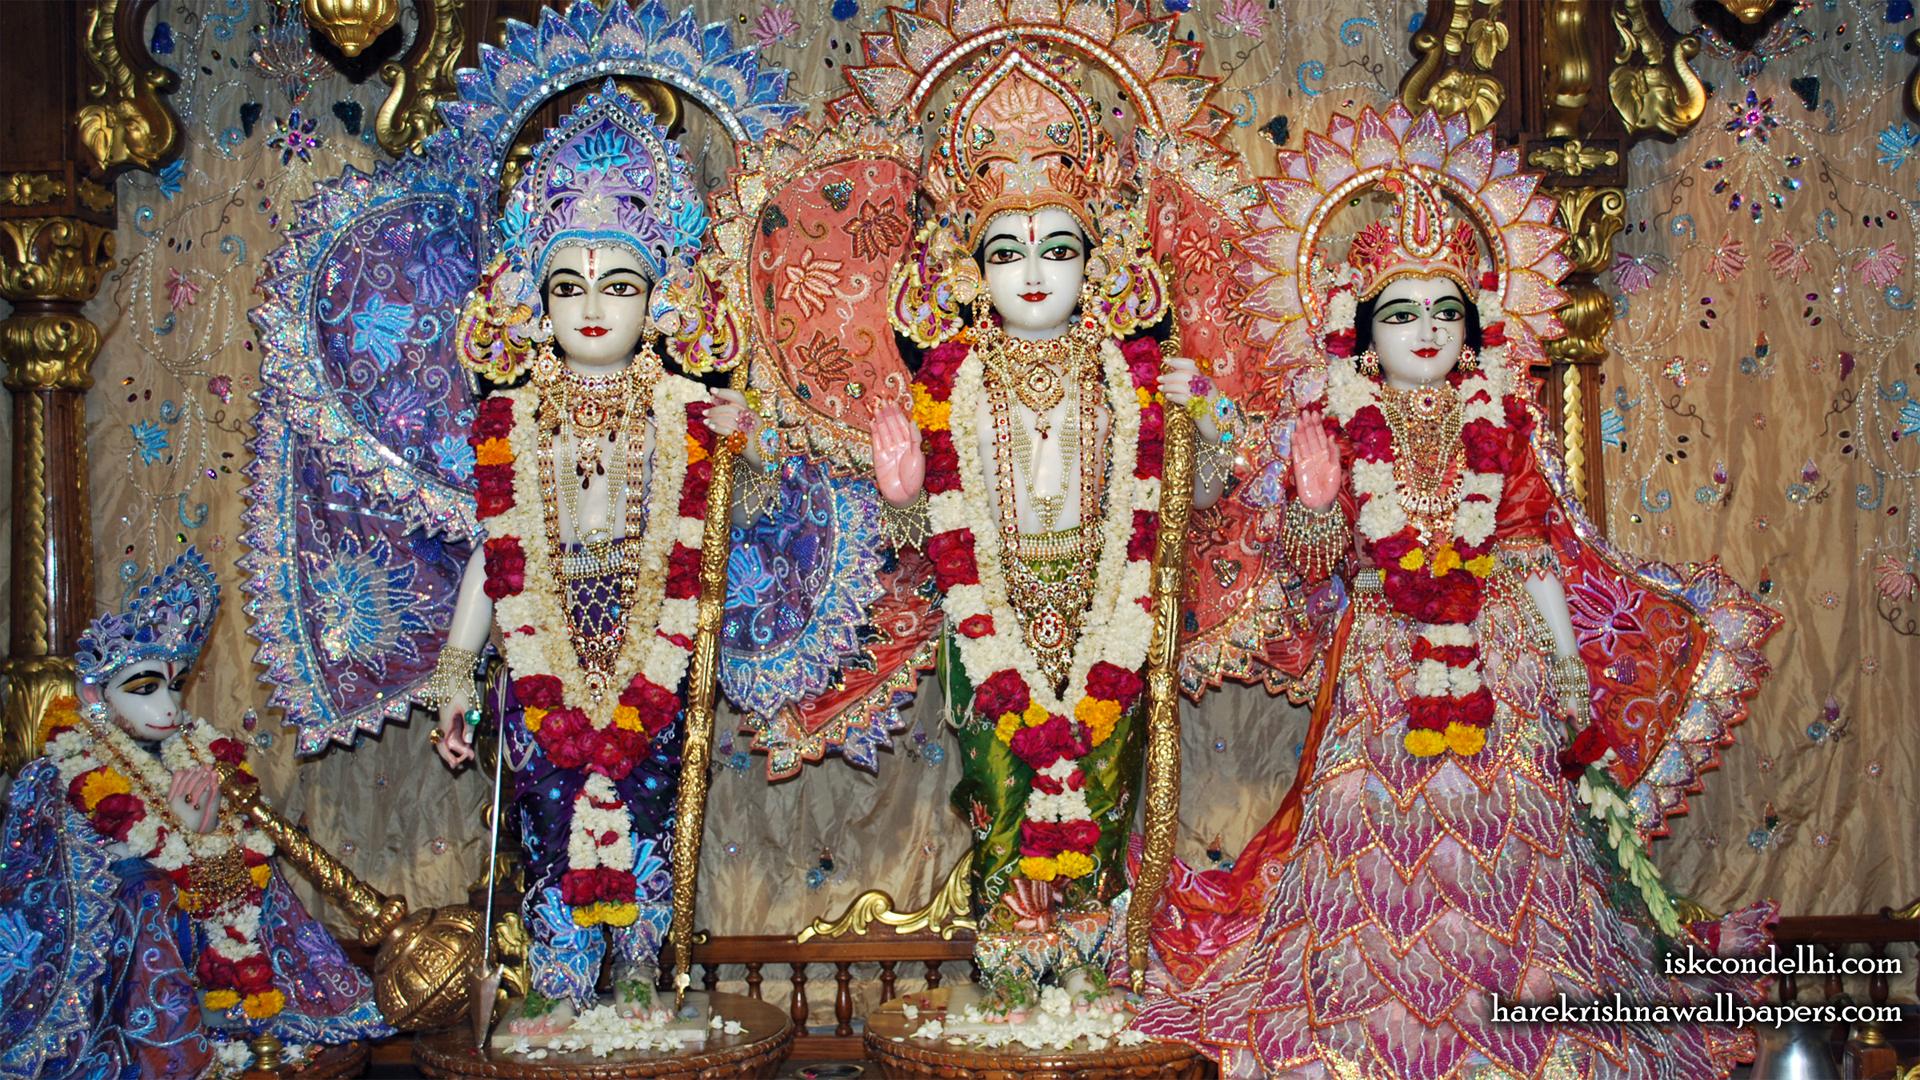 Sri Sri Sita Rama Laxman Hanuman Wallpaper (018) Size 1920x1080 Download